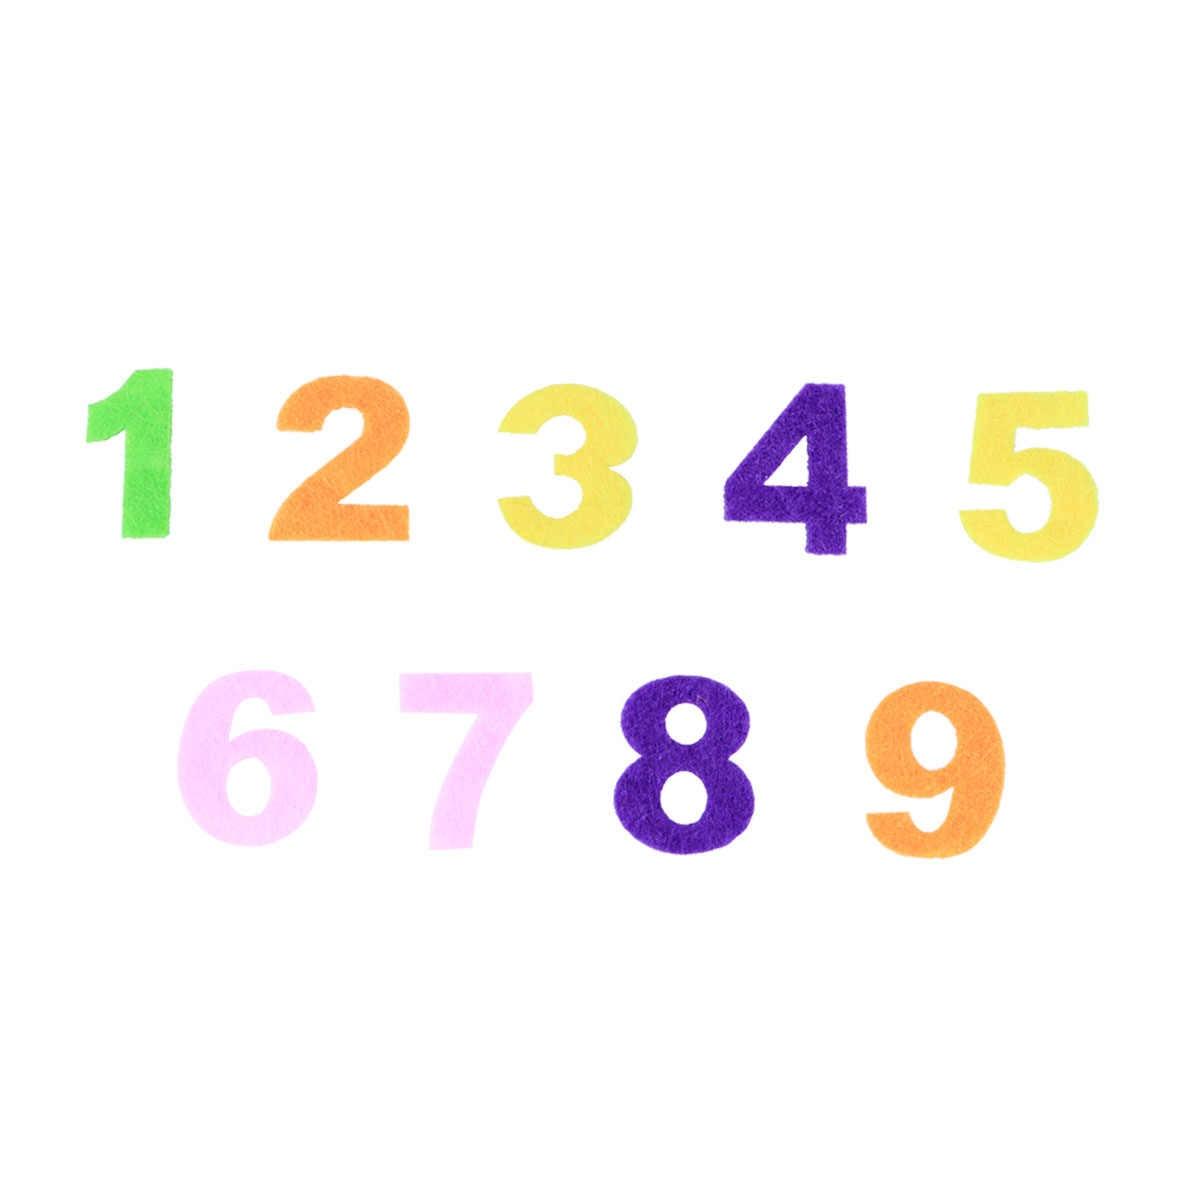 100 In 1 ผ้าไม่ทอตัวอักษรตัวอักษรตัวเลข DIY Craft Handmade อุปกรณ์เสริมสำหรับ Scrapbooking ตกแต่งของขวัญ